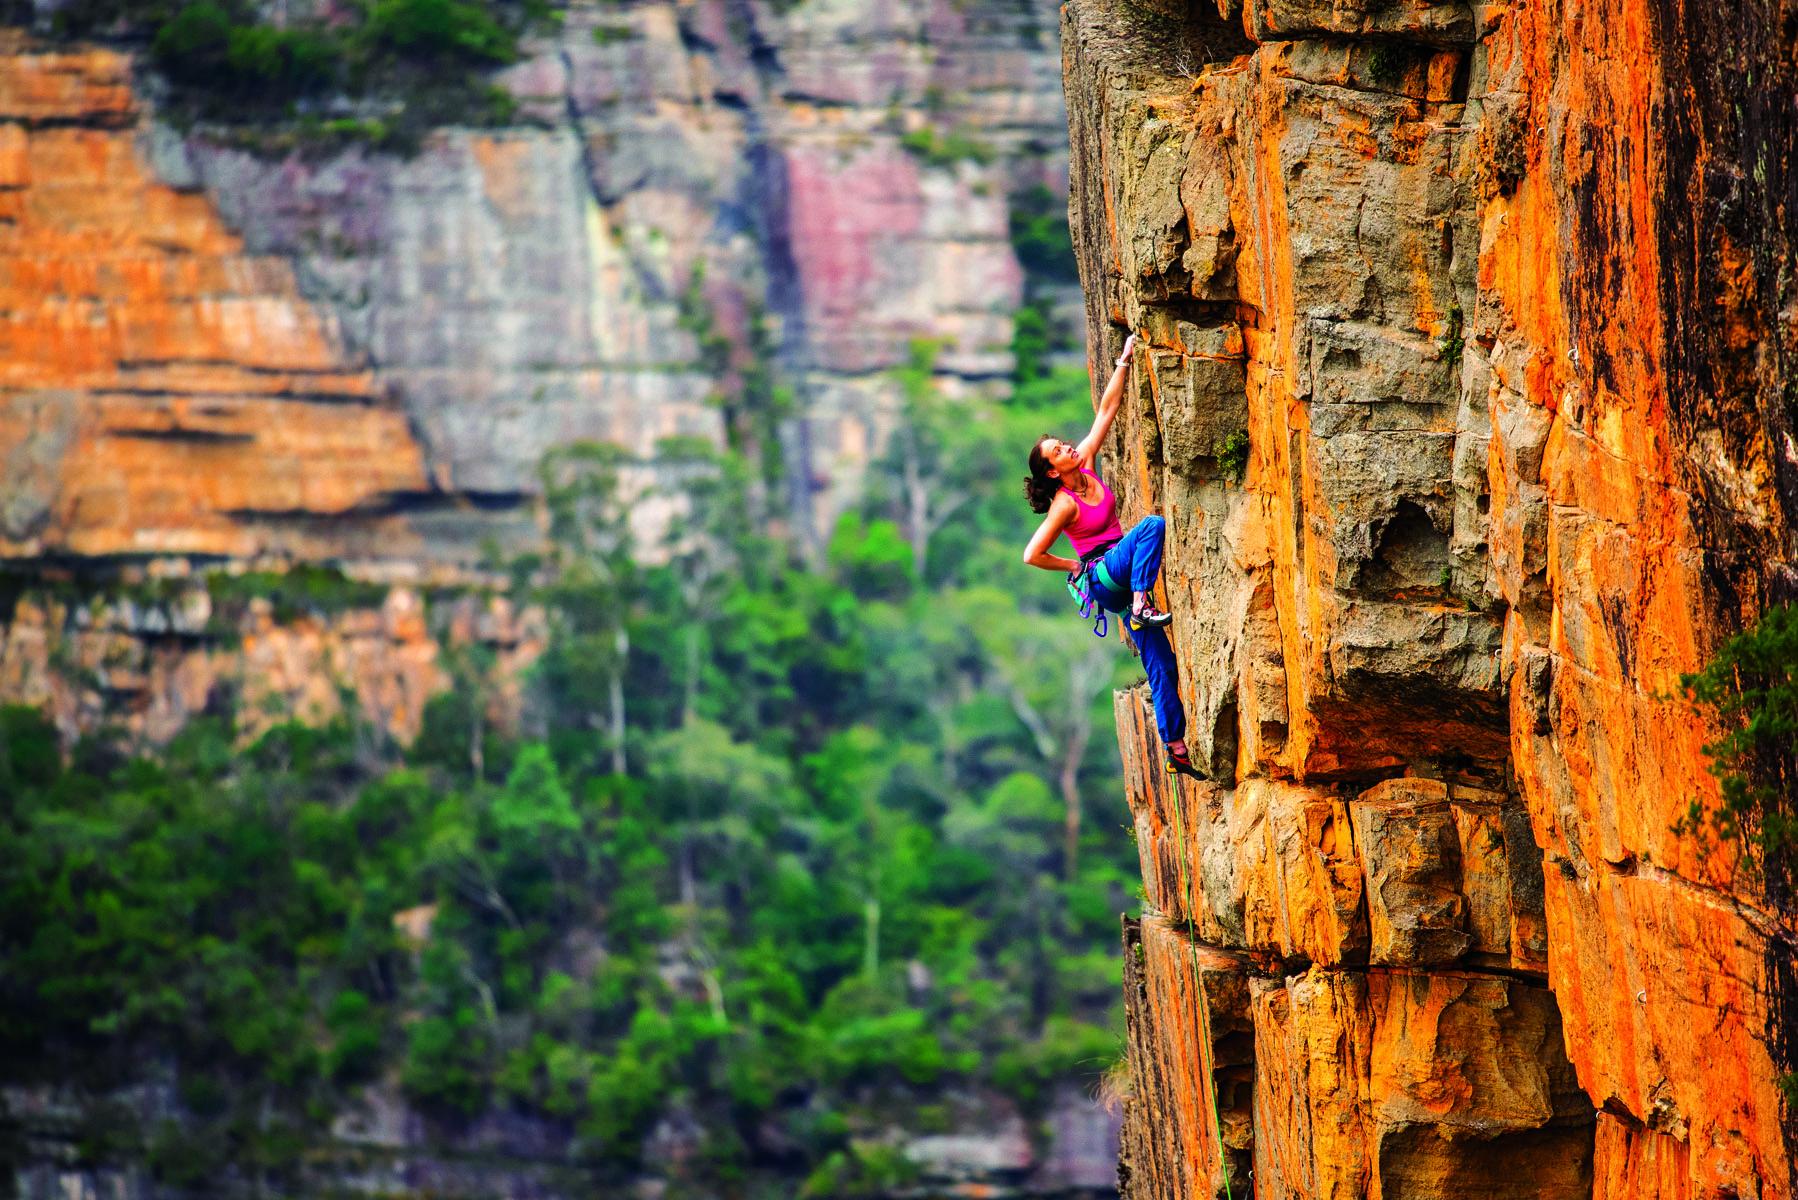 Melissa Mooney, Weakened Worrier (25), Ben Trovarto Wall, Sublime Point, Blue Mountains. PICTURE CREDIT: Simon Carter.